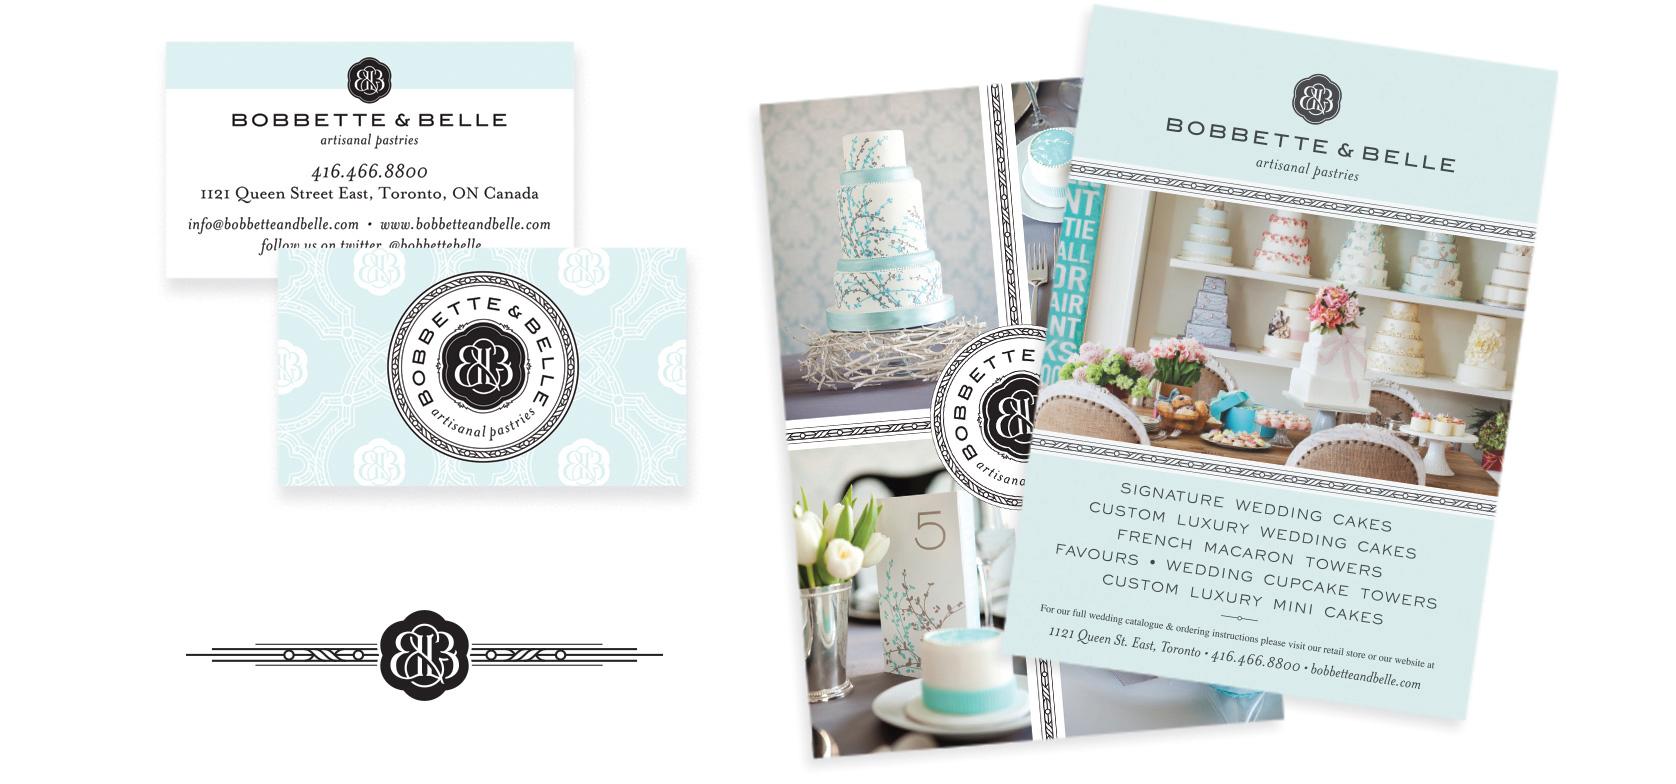 Bobbette & Belle Logo design by Chad Roberts Design